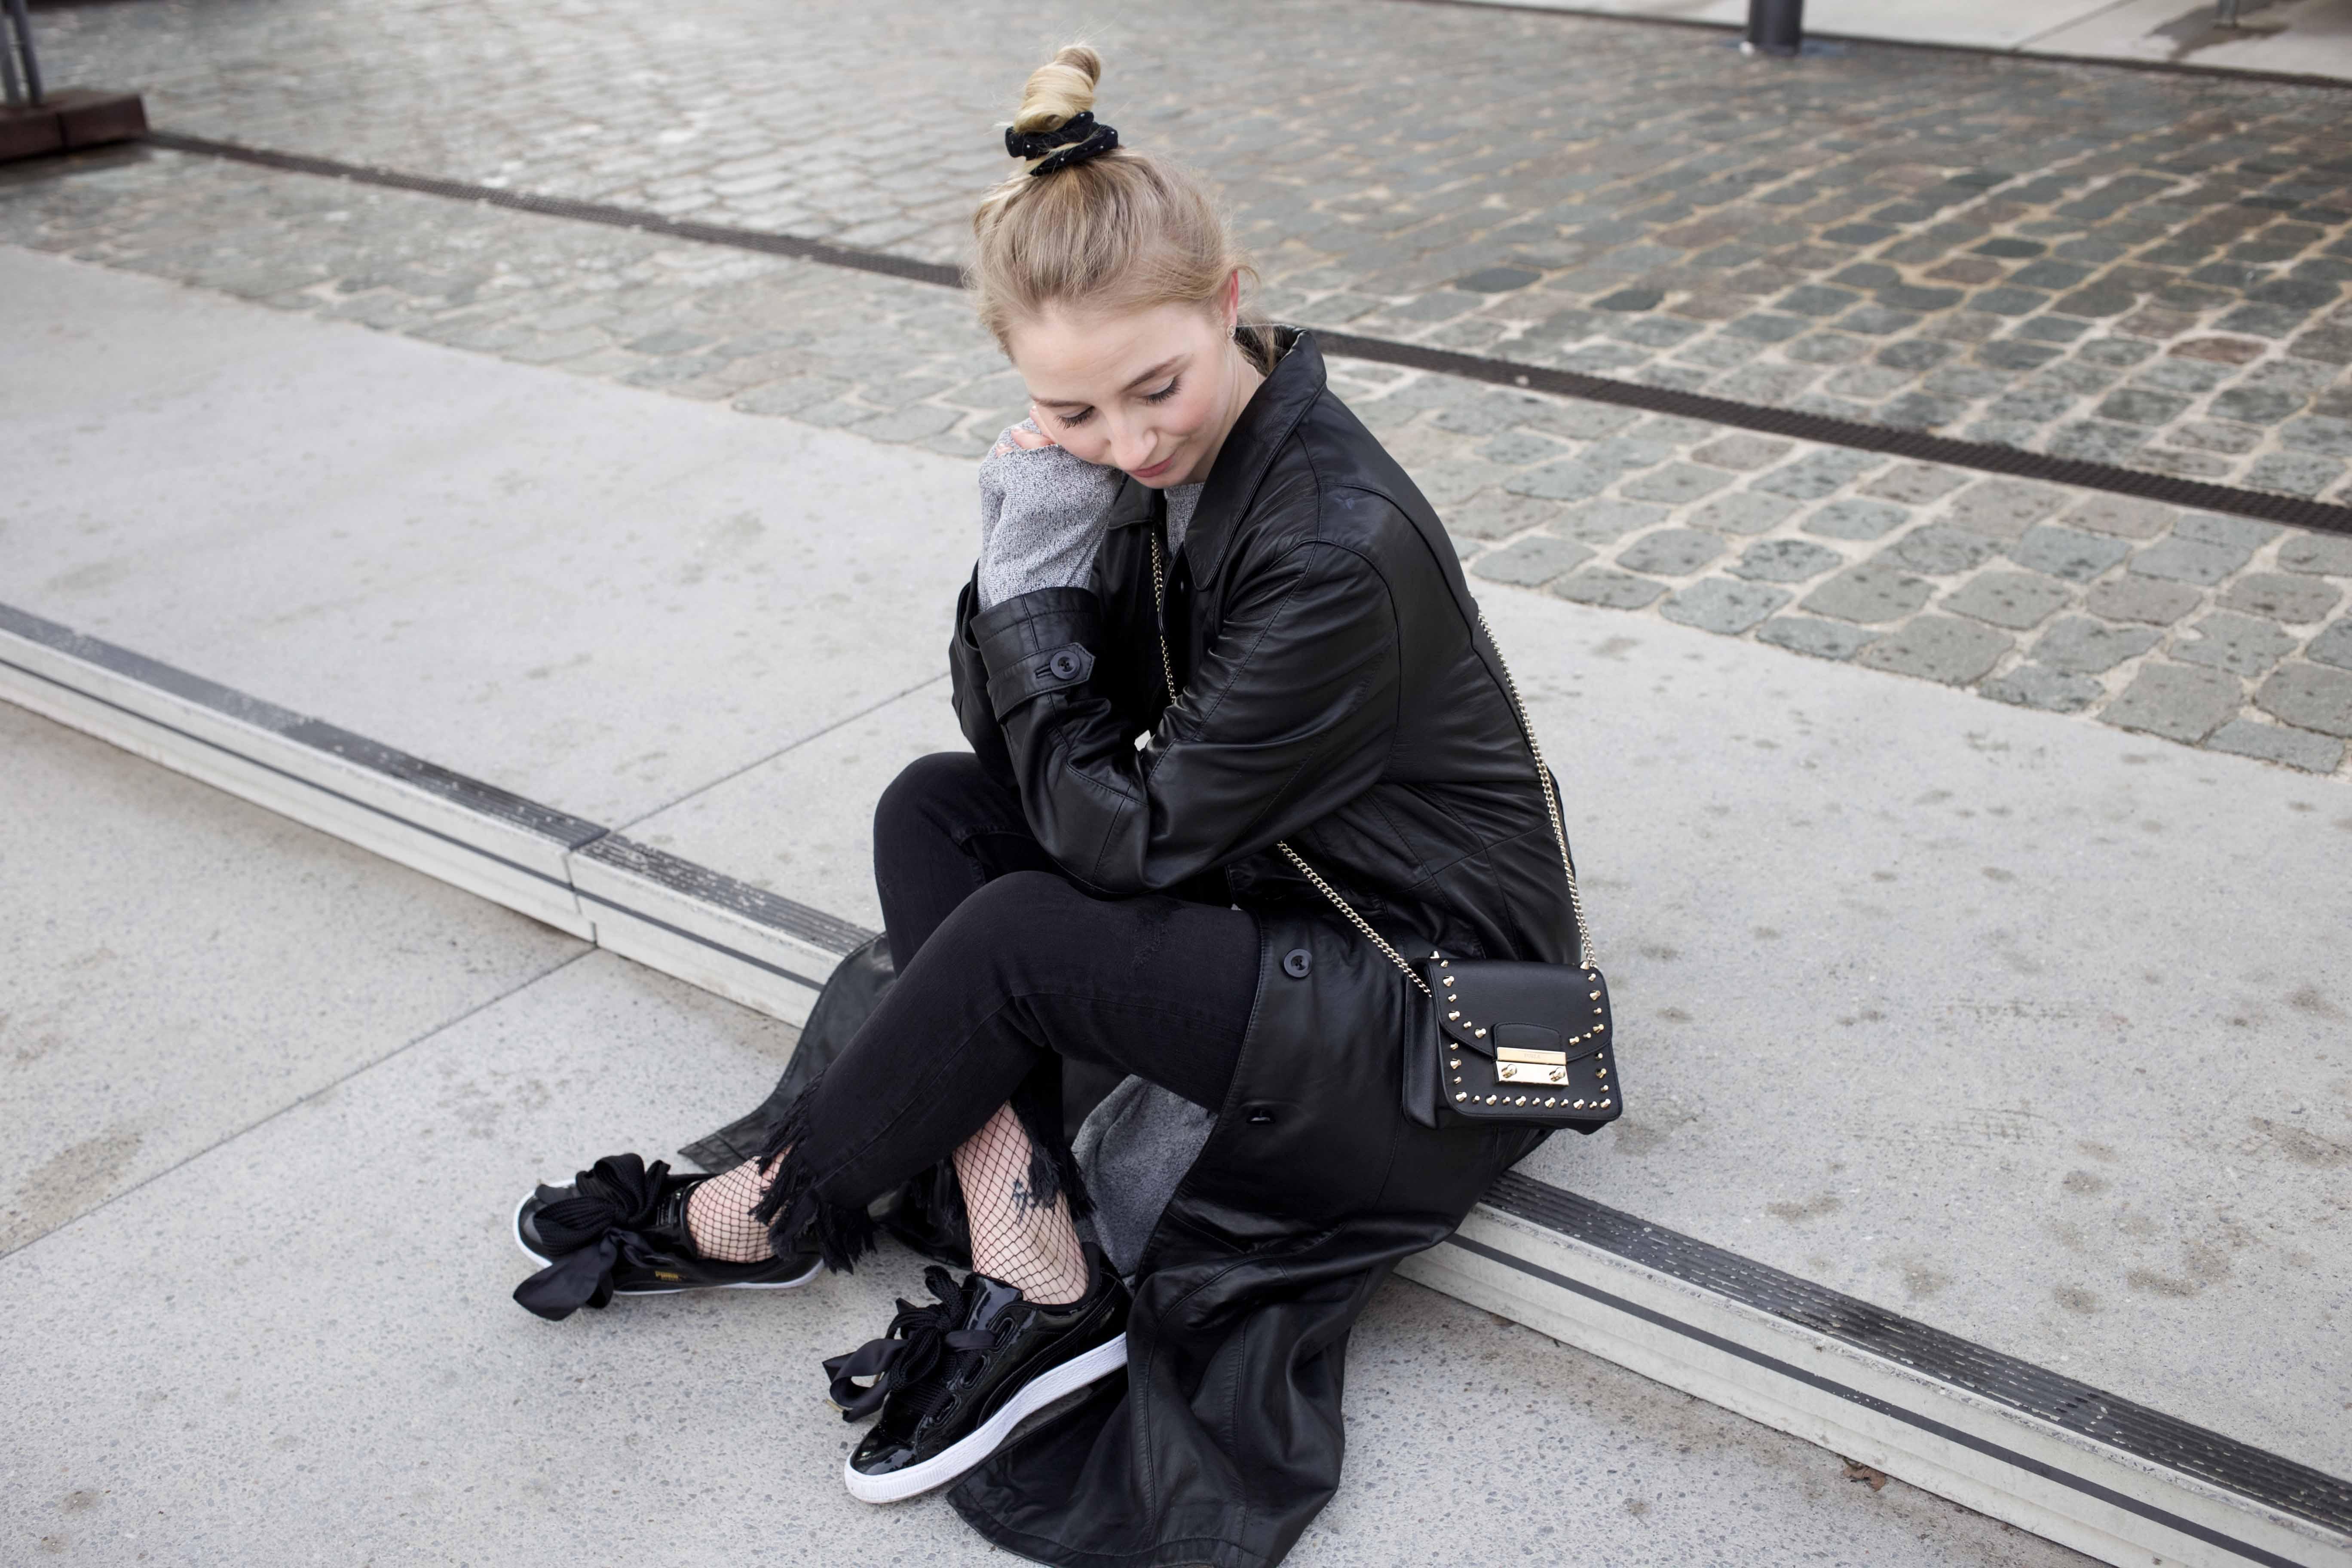 Netzstrumpfhose-kombinieren-Trend-Outfit-Fashionblog-PUMA-Basket-Ledermante_9535